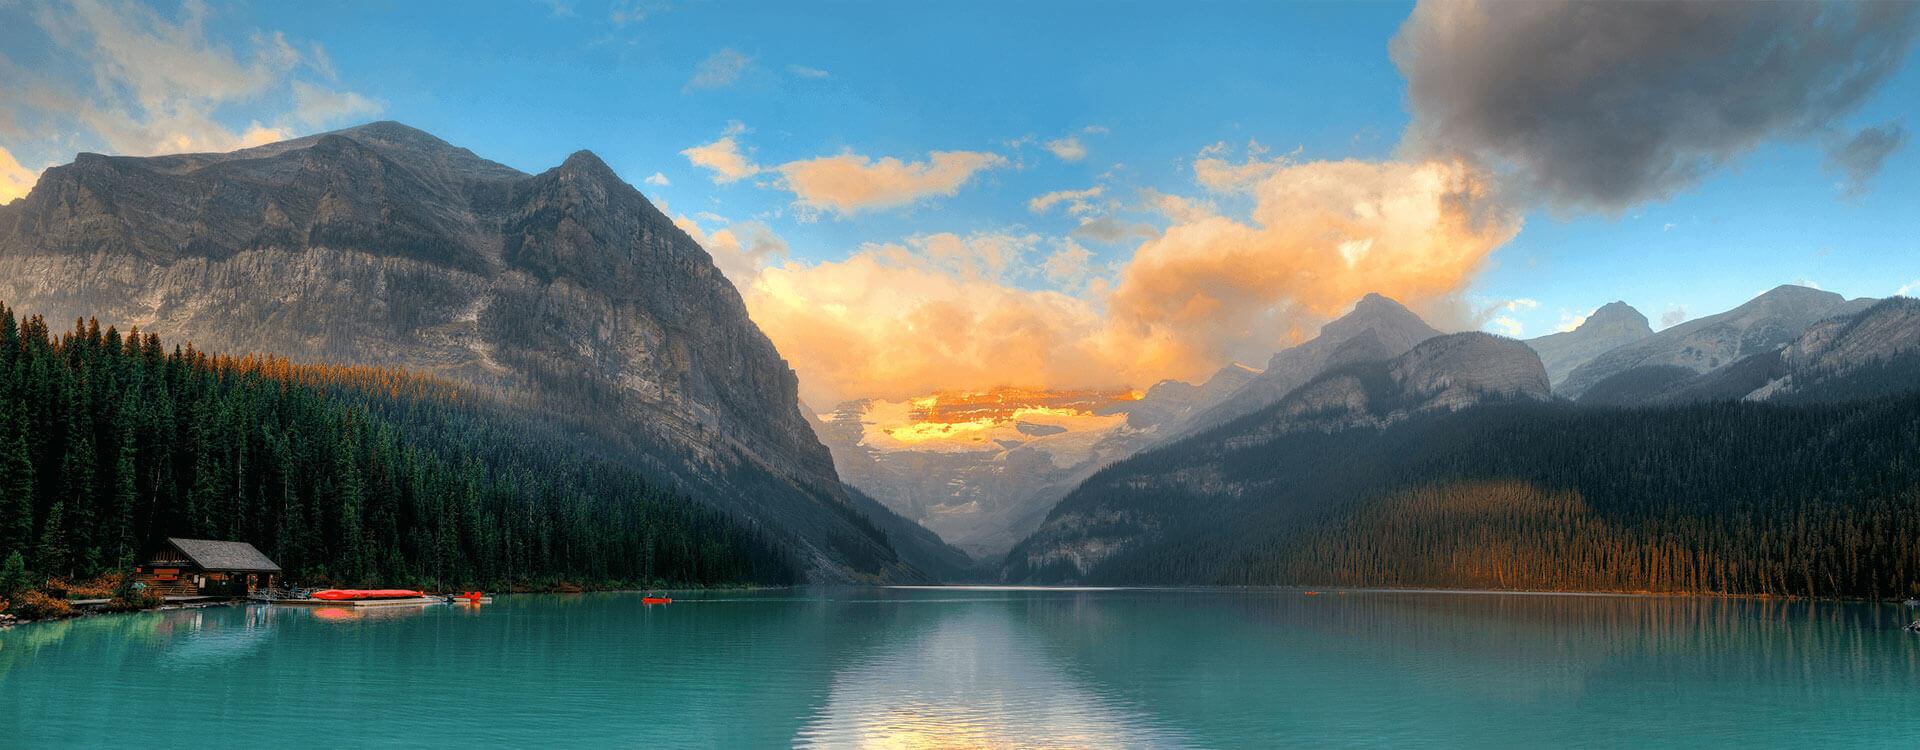 Kanada Gruppenreise